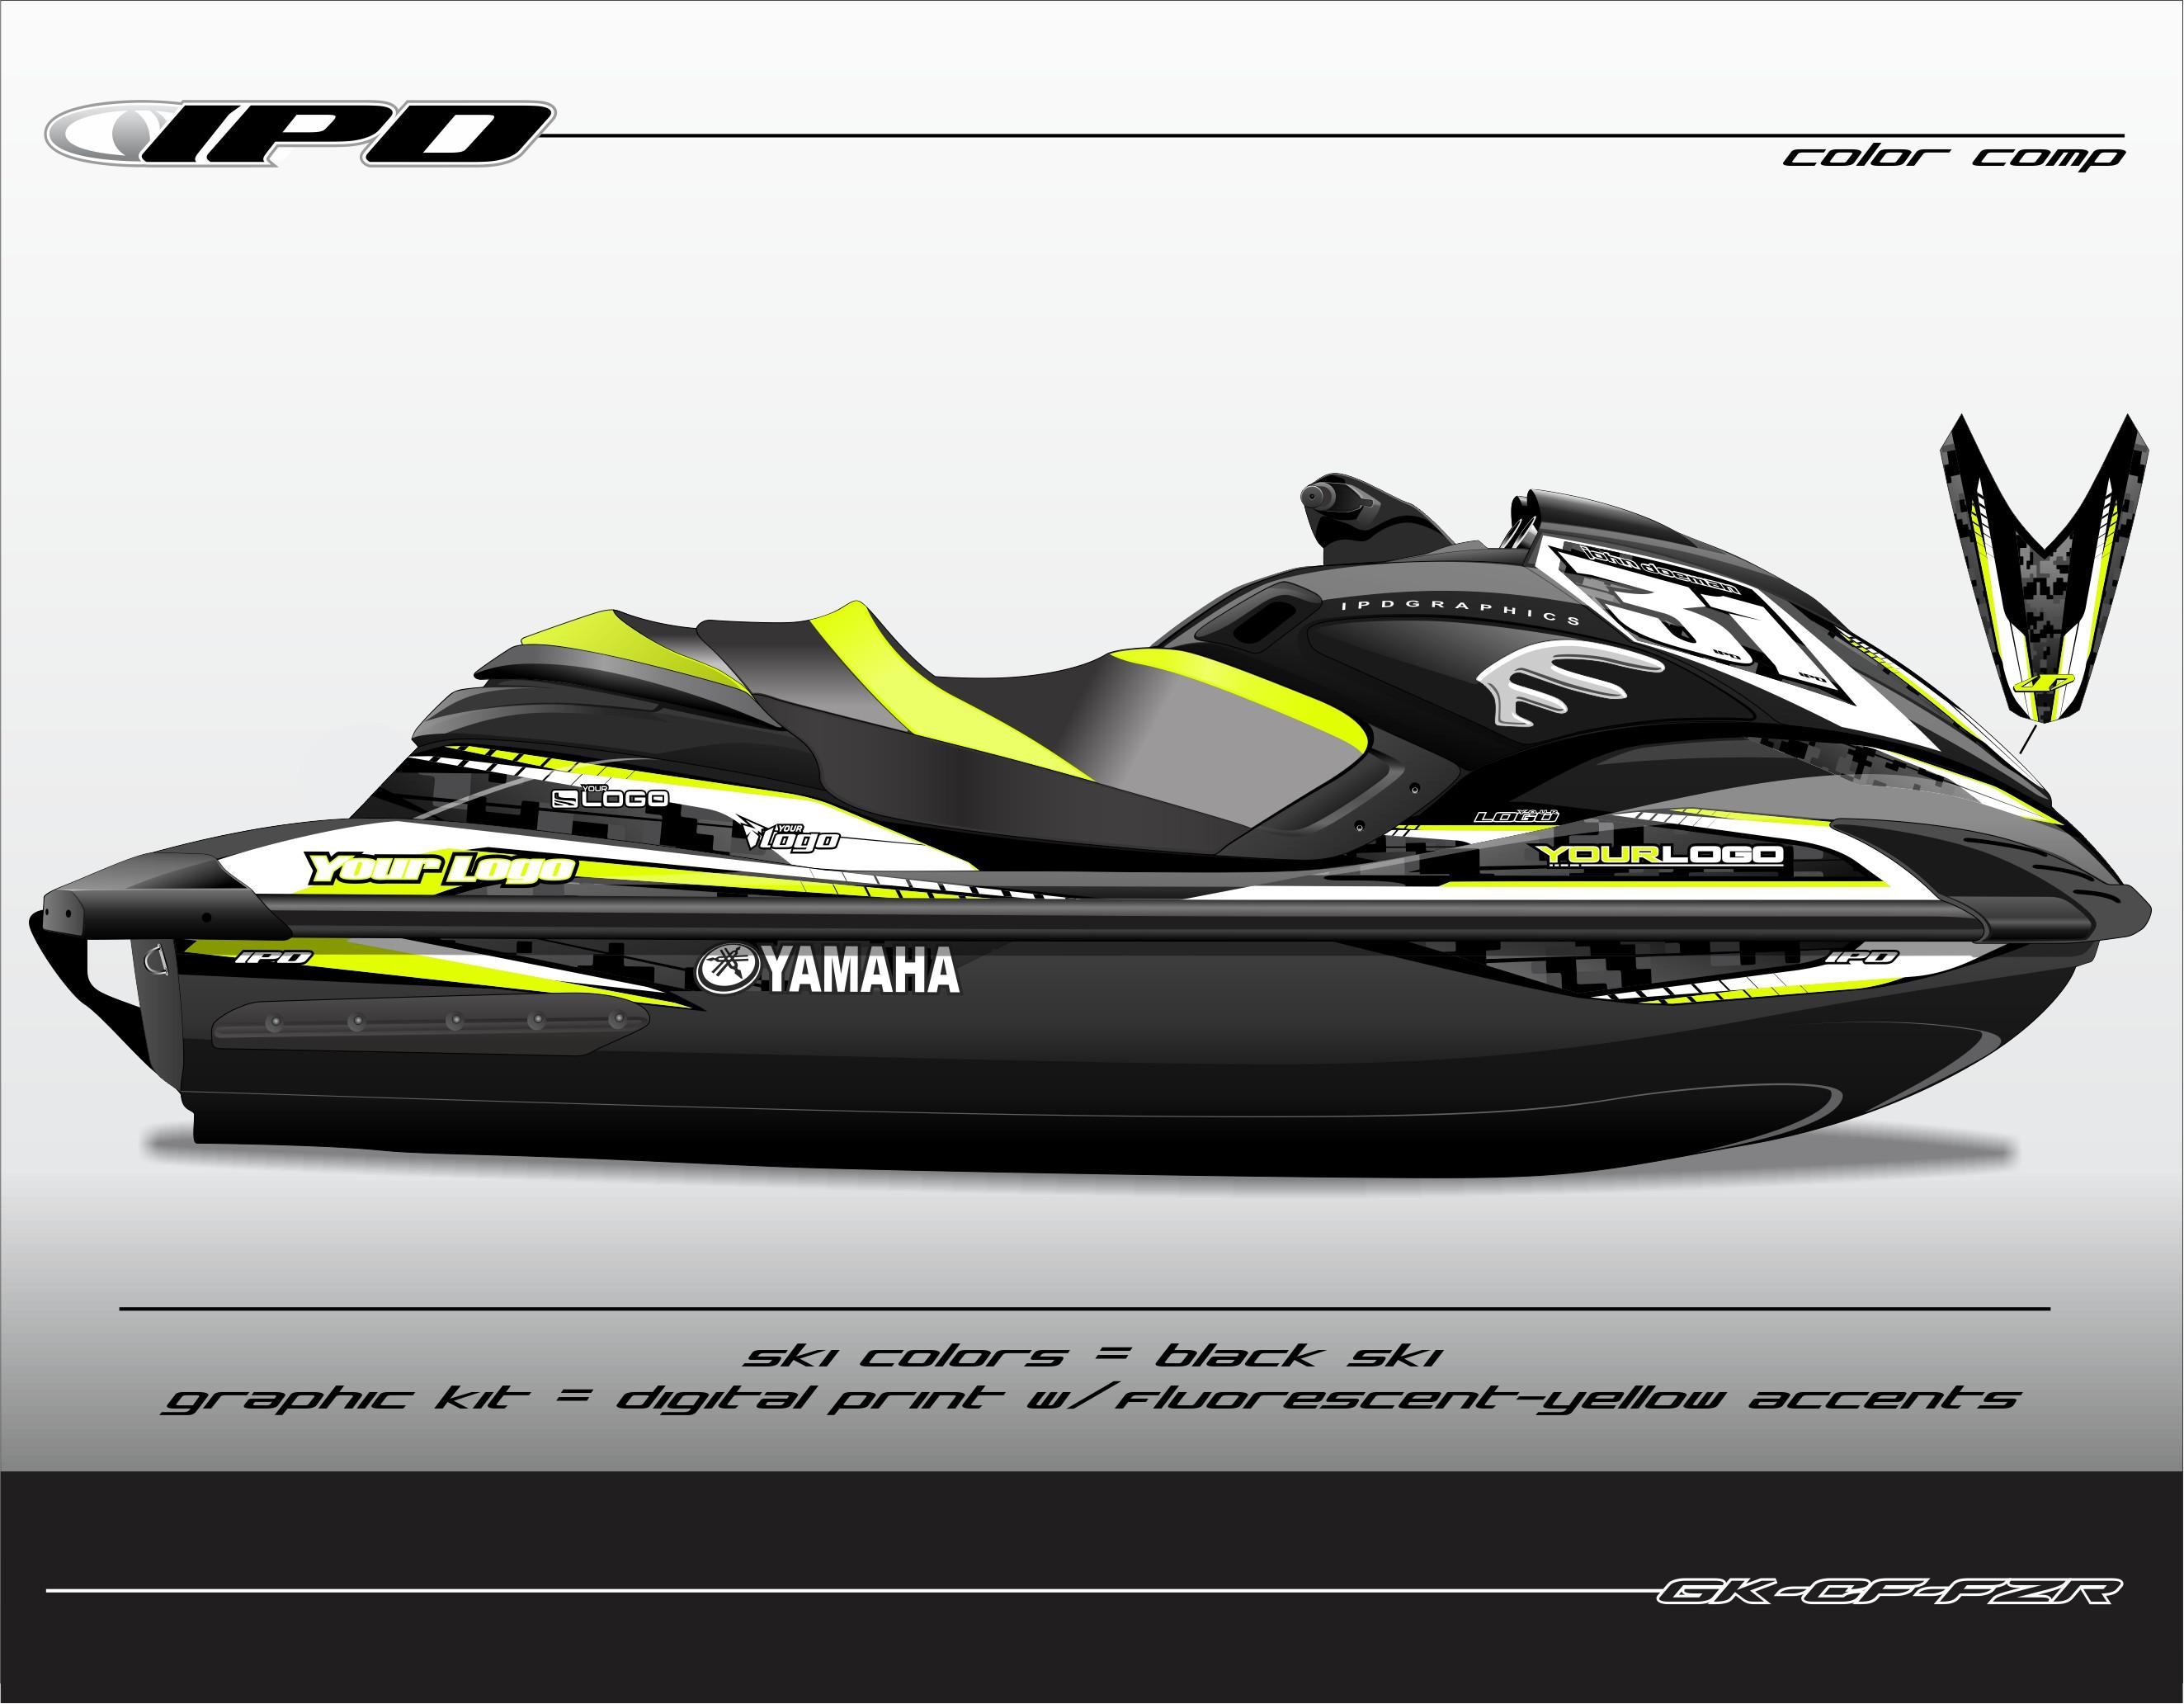 yamaha fzs fzr graphics kit cf design ipd jet ski. Black Bedroom Furniture Sets. Home Design Ideas